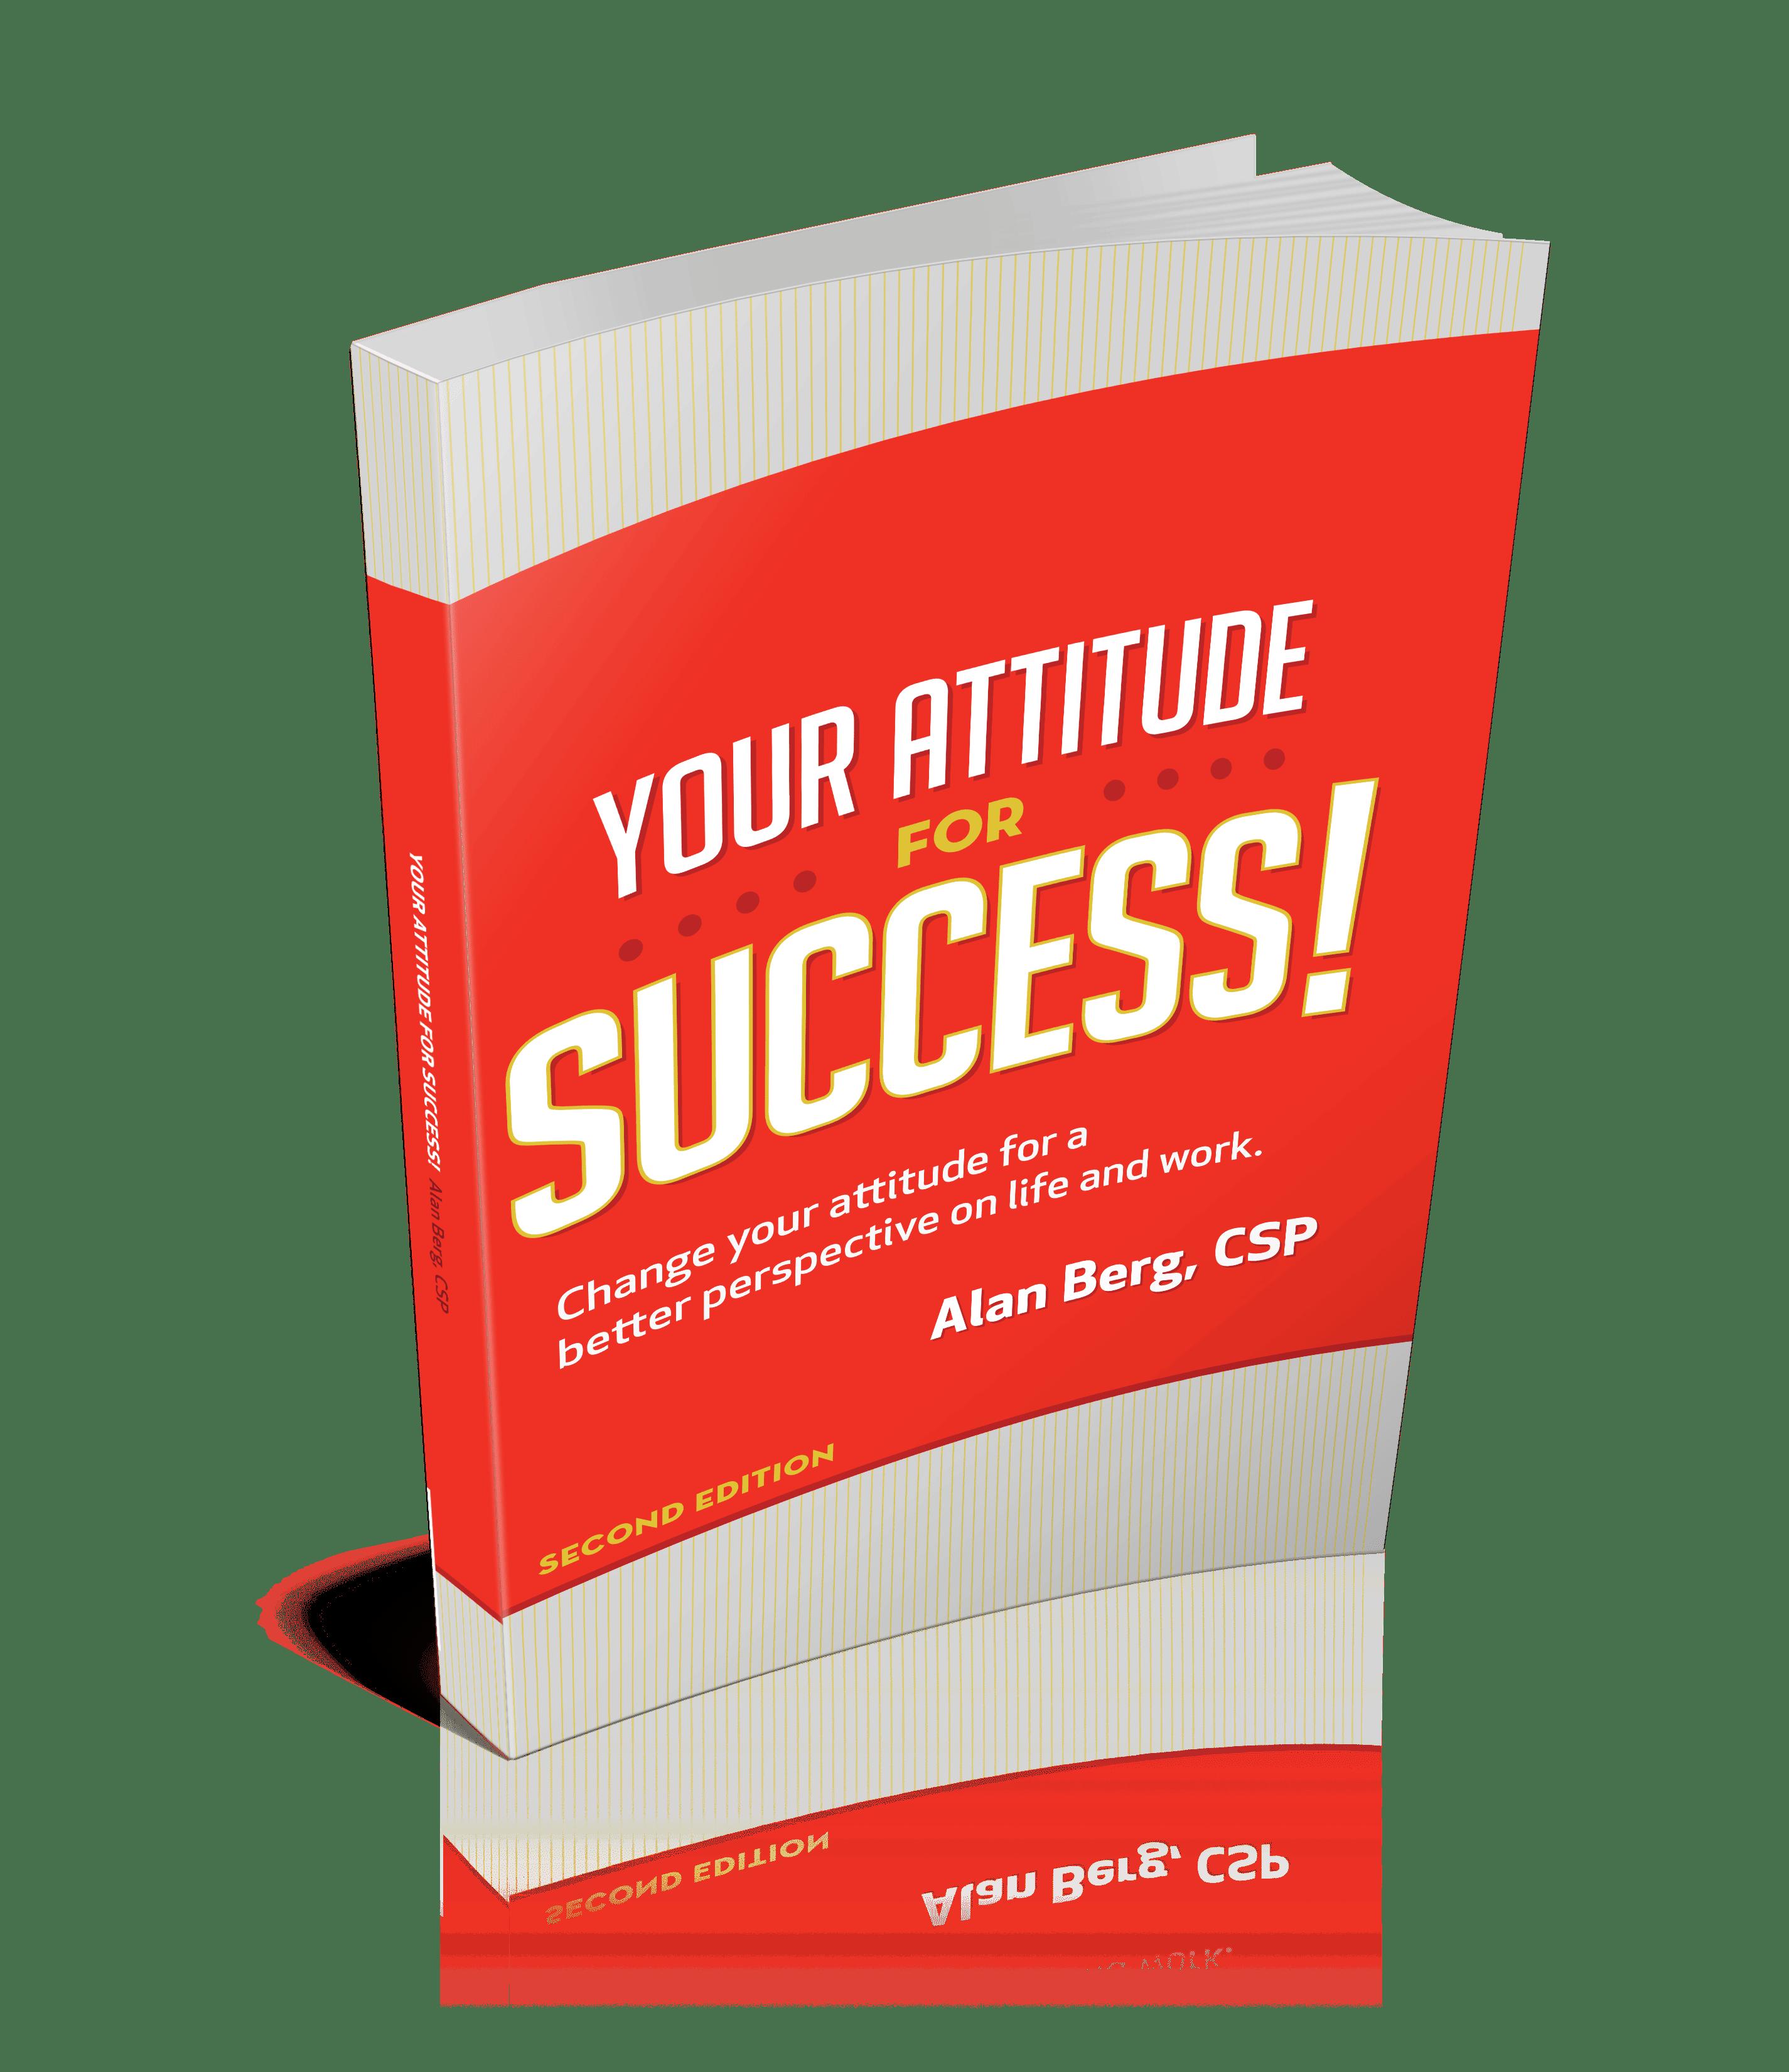 Your Attitude for Success - Alan Berg CSP